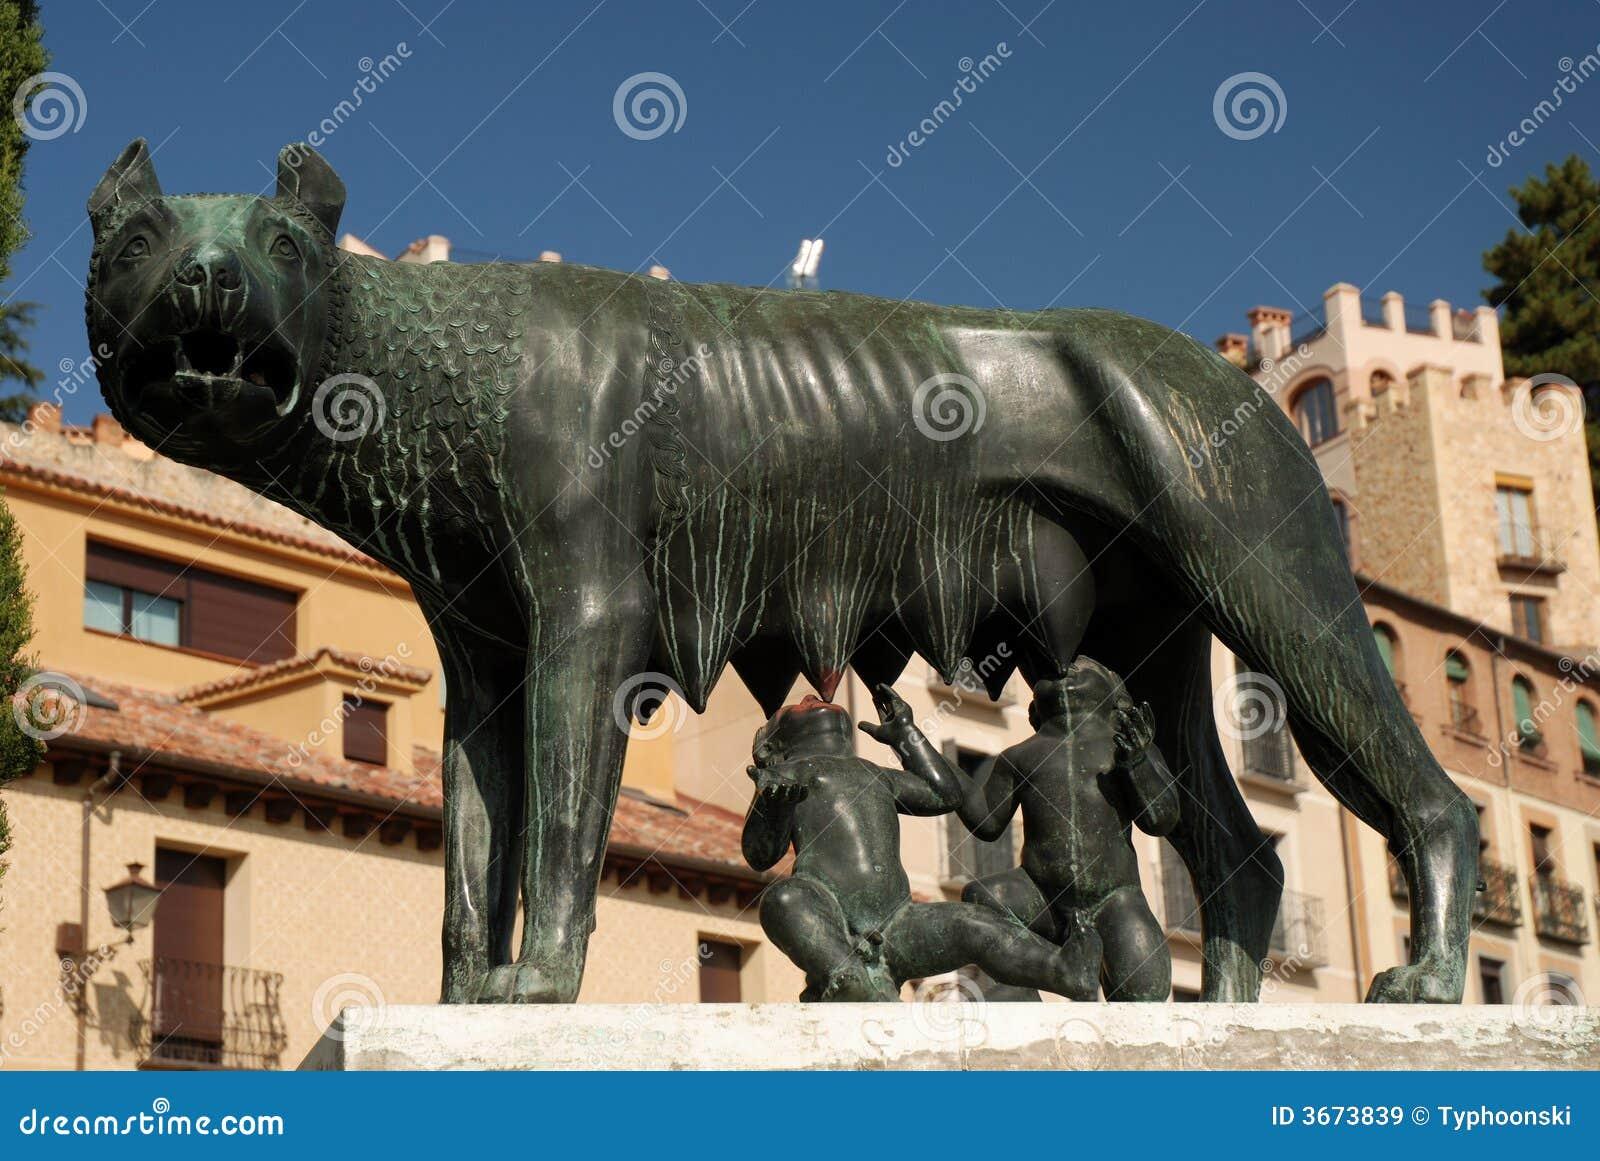 romulus und remus statue lizenzfreie stockbilder bild 3673839. Black Bedroom Furniture Sets. Home Design Ideas